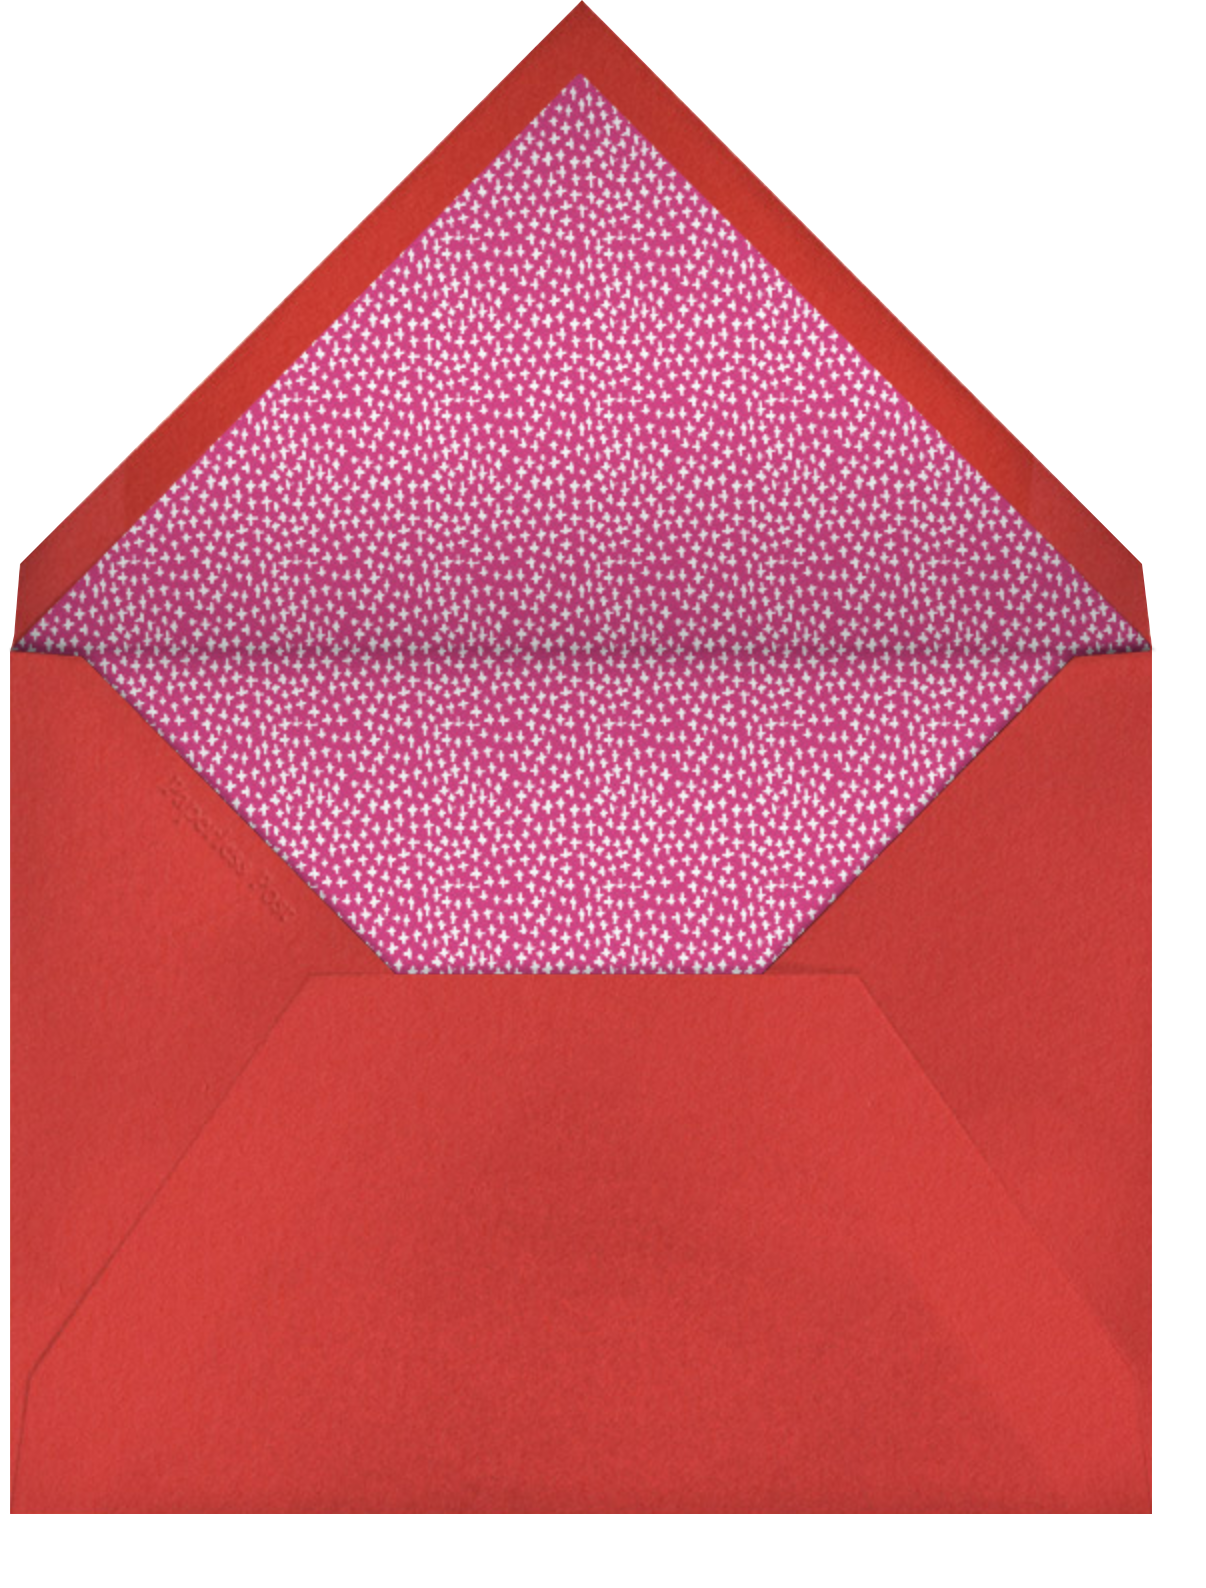 One Big Happy Family - Mr. Boddington's Studio - Holiday cards - envelope back